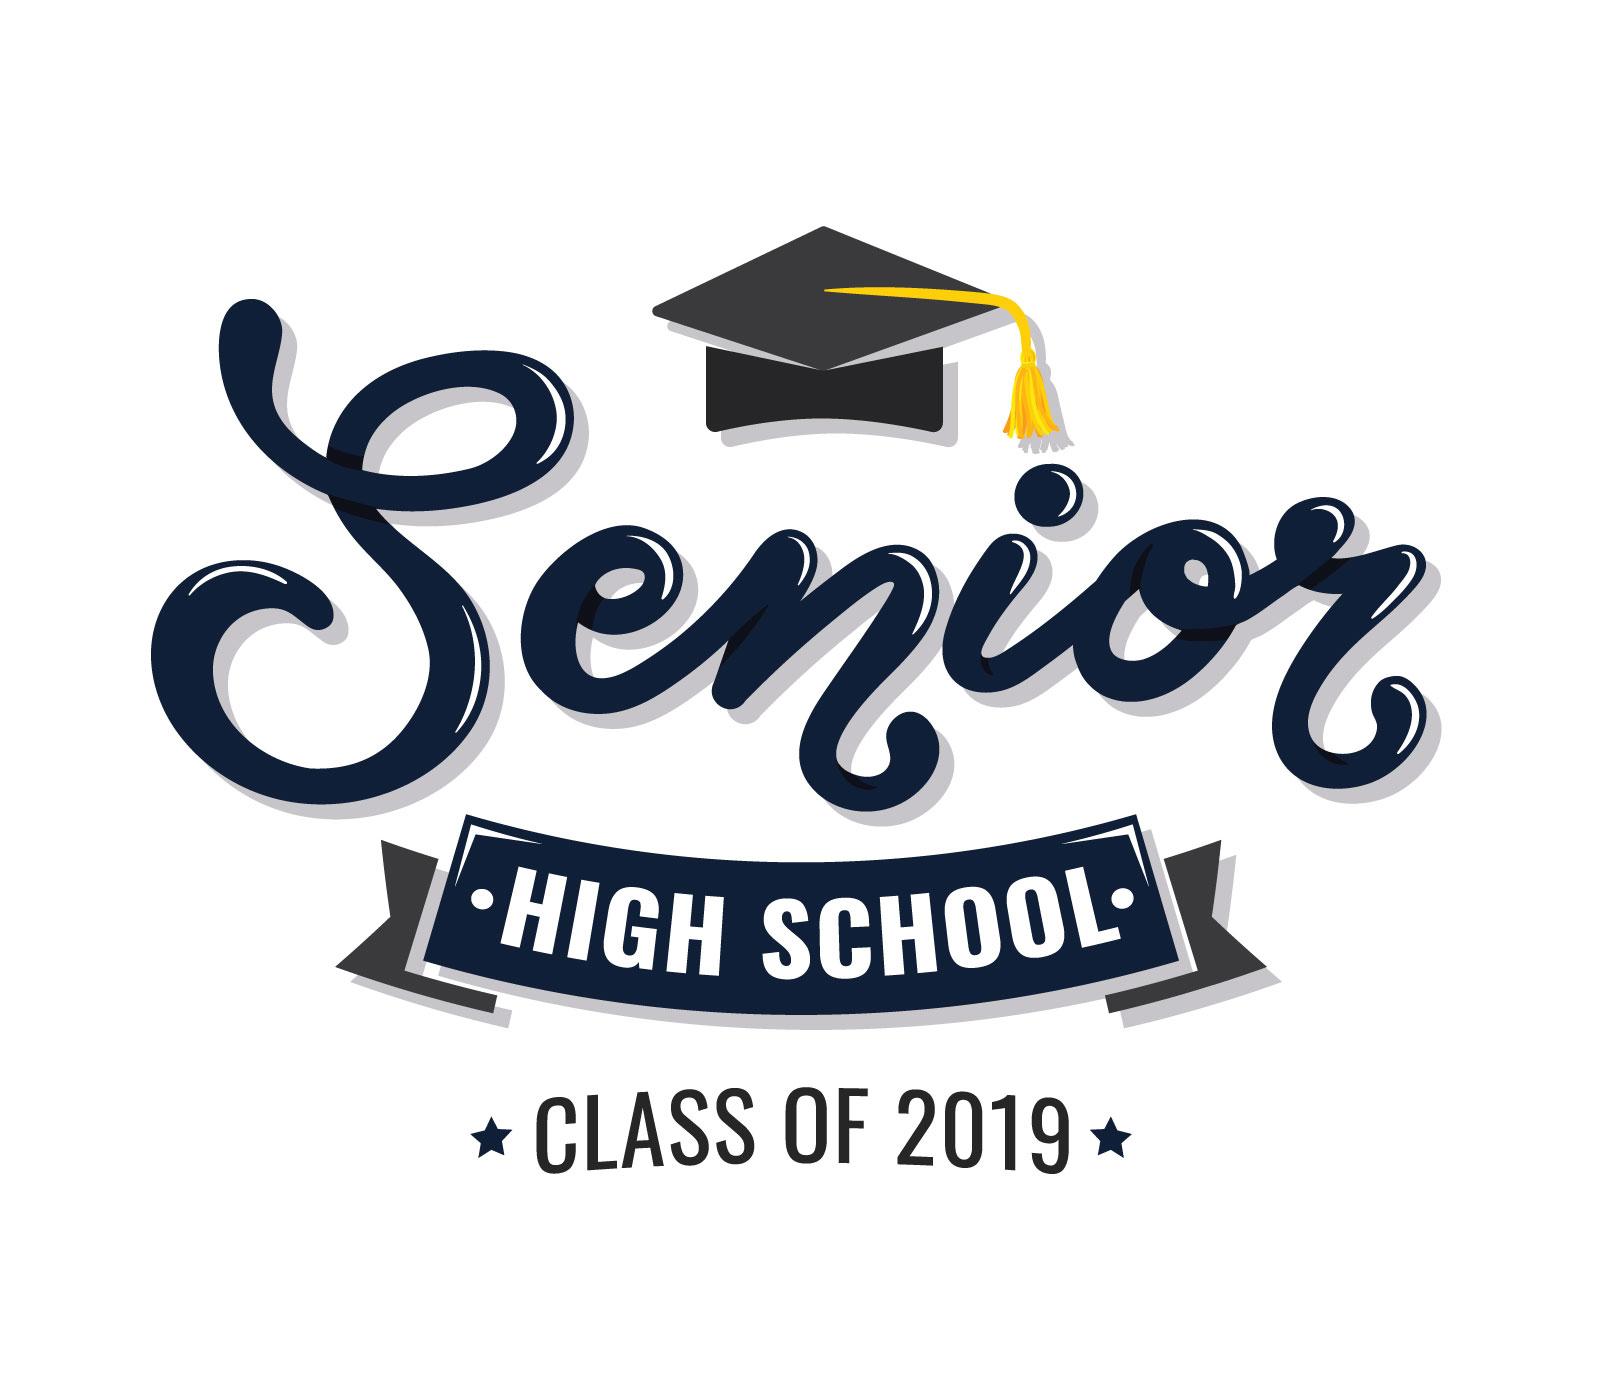 Senior High School Typography